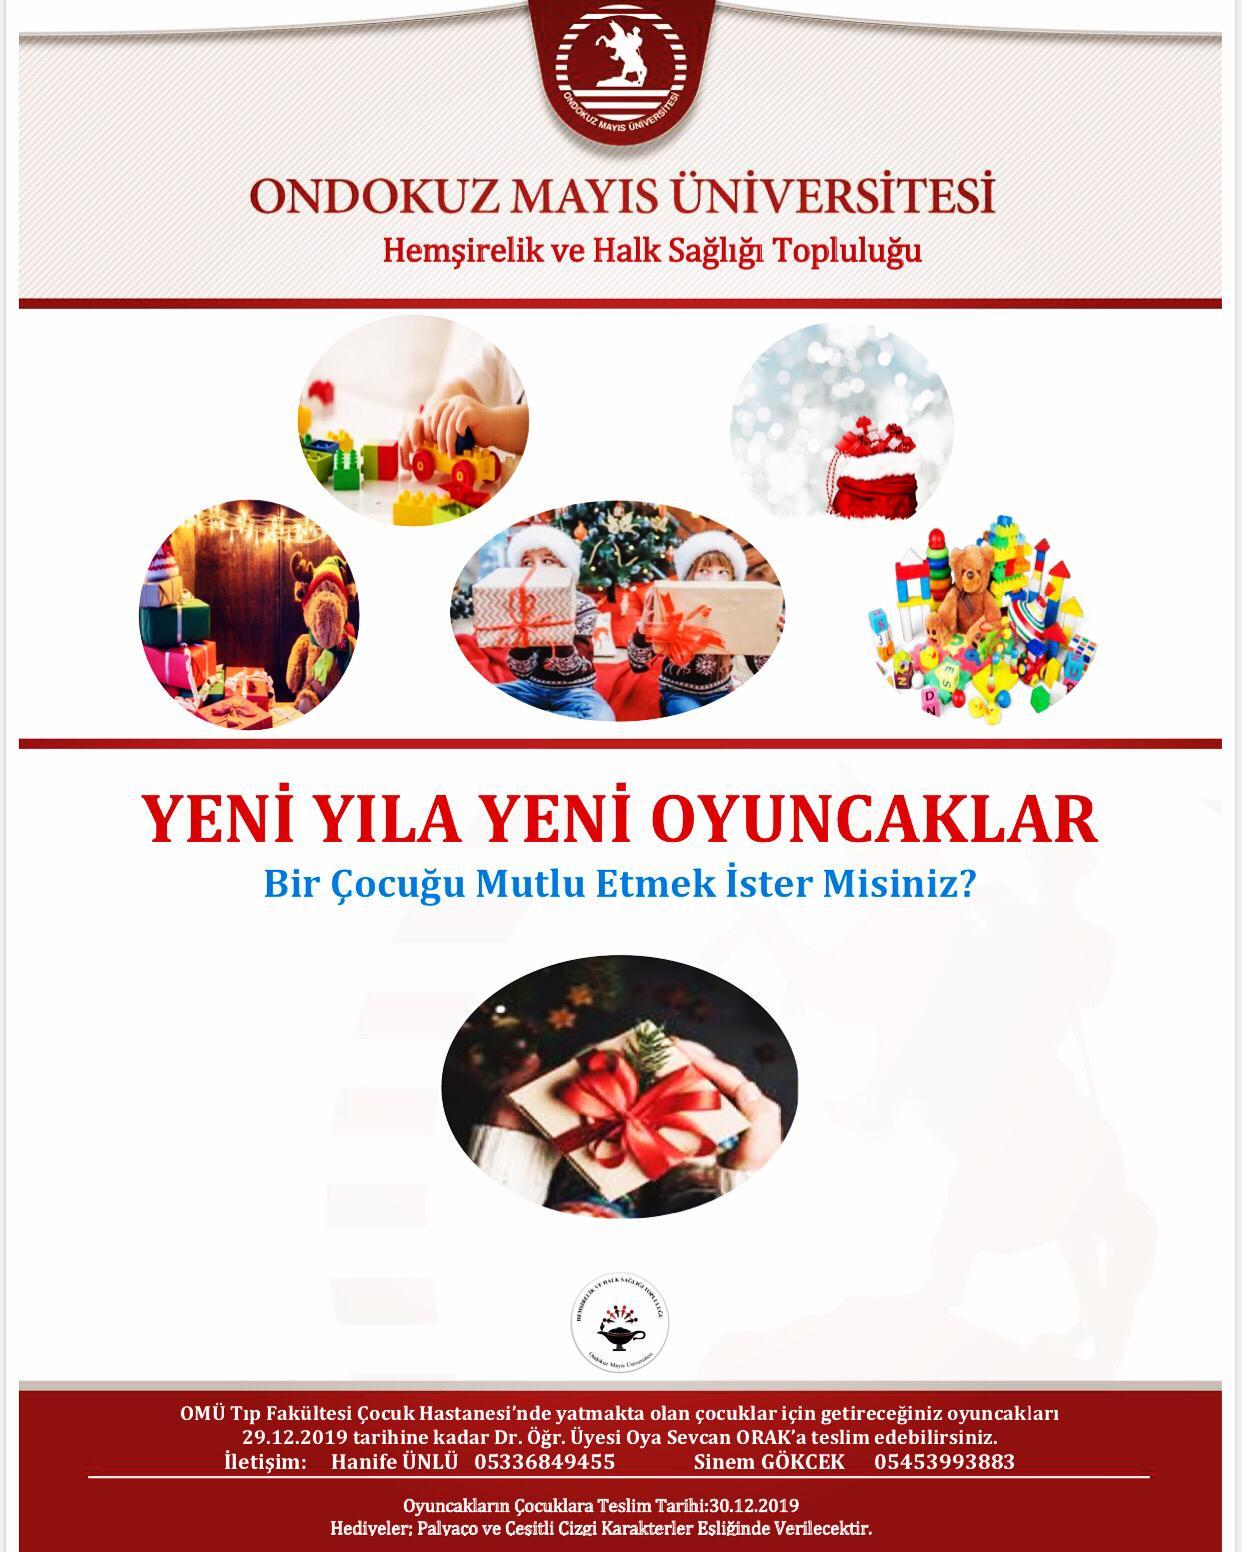 https://www.omu.edu.tr/sites/default/files/saglik_bilimleri_hediye.jpeg